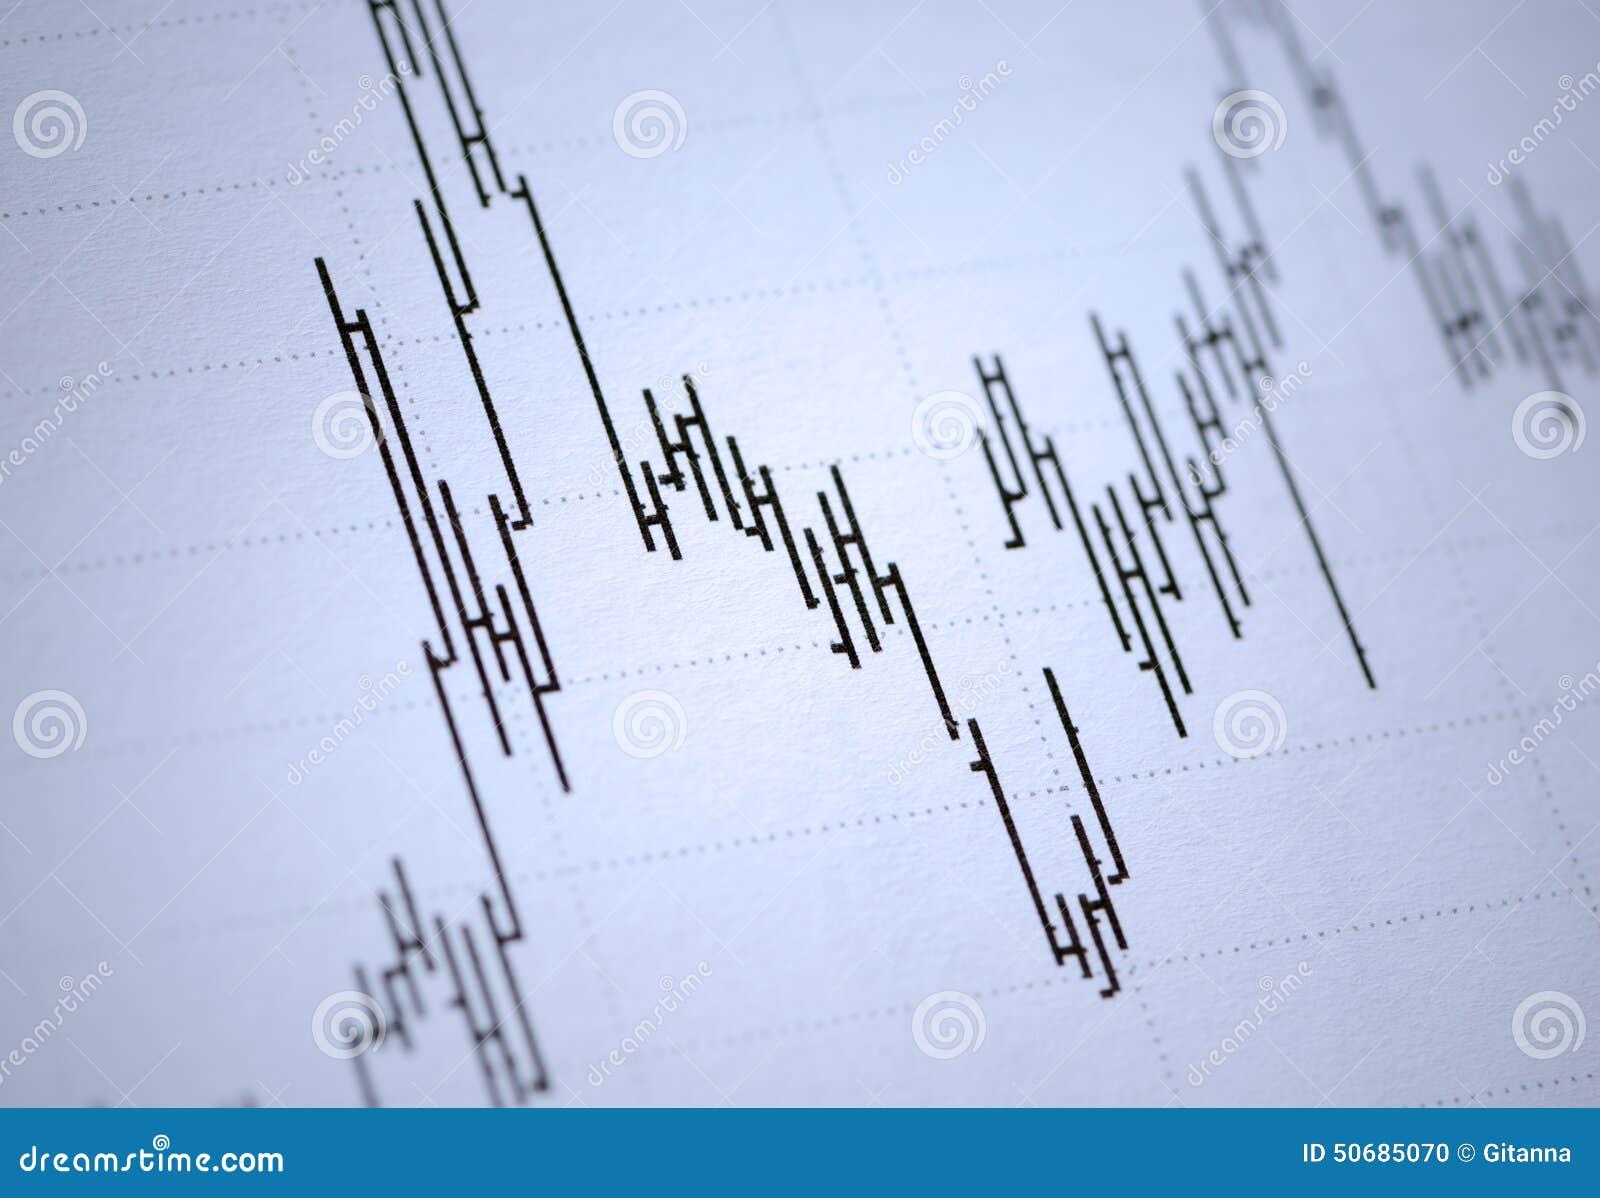 Download 财政机会的研究 库存照片. 图片 包括有 概念, 察视, 图形, 附注, 增长, 收入, 销售额, 经济 - 50685070